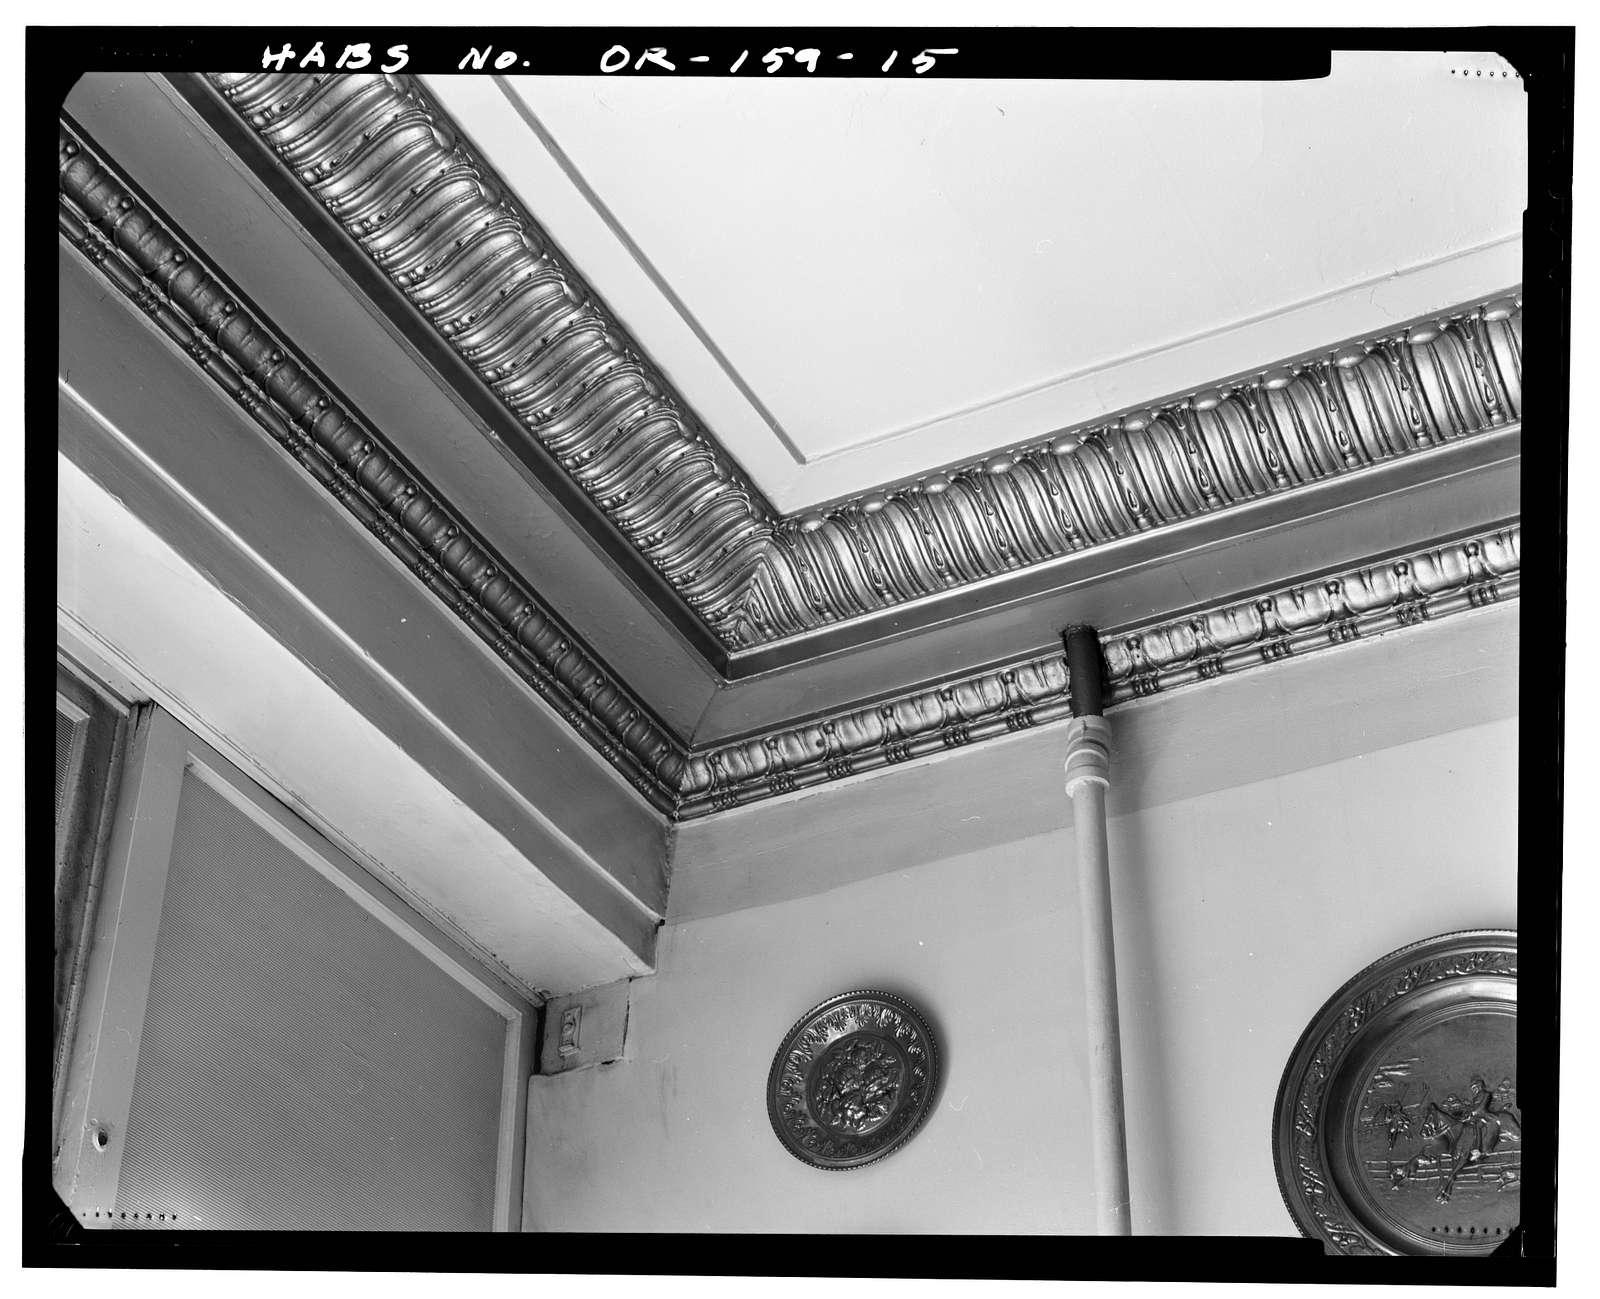 Venable Hotel, 1024 Southwest Third Avenue, Portland, Multnomah County, OR